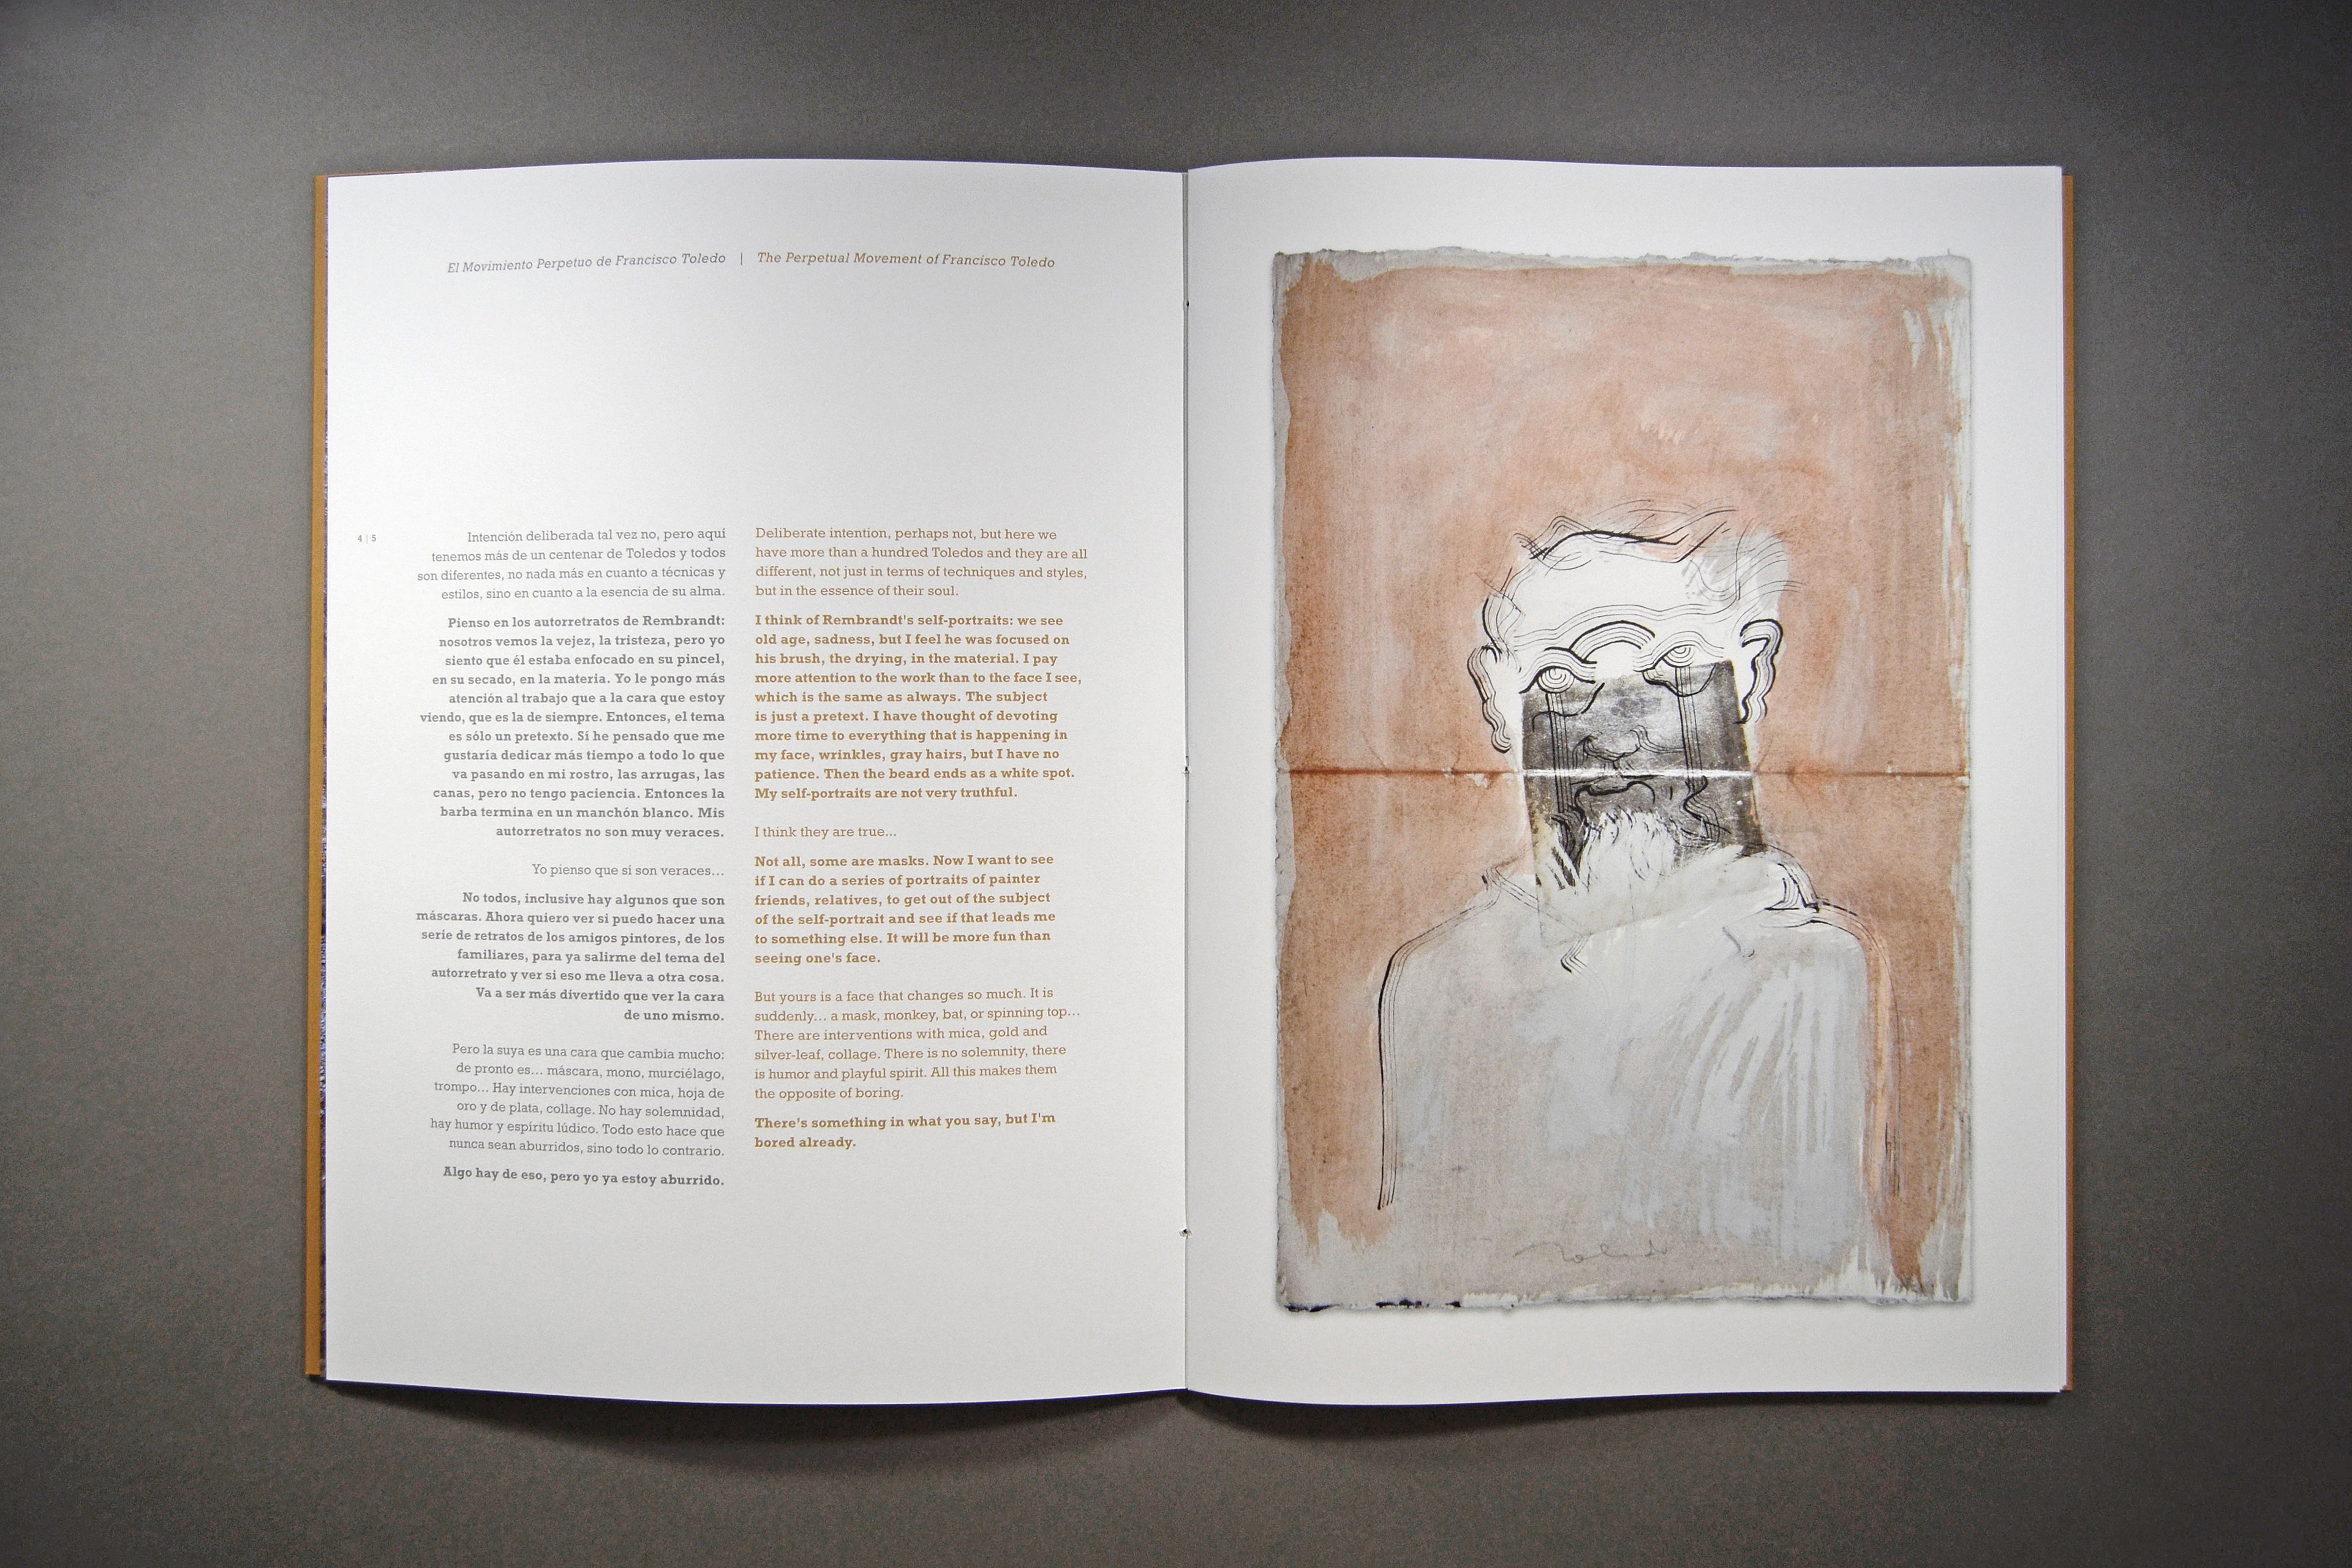 David Mellen Design - Latin American Masters exhibition catalogs